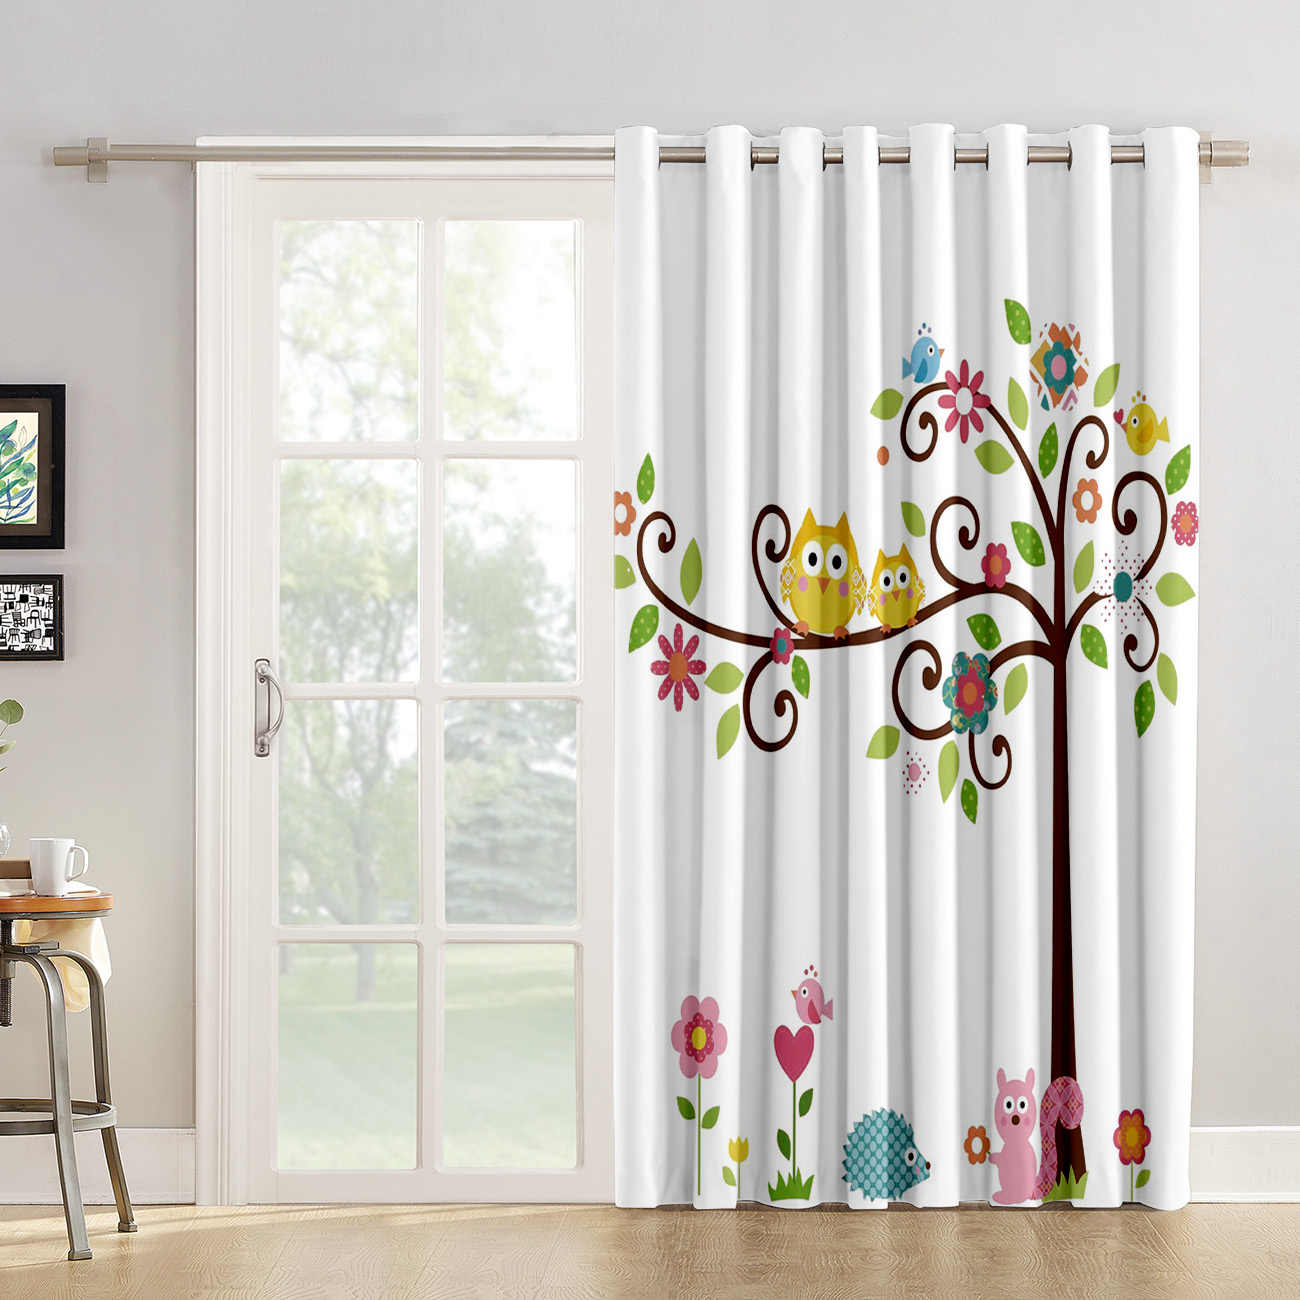 Cute Cartoon Owl Squirrel Window Treatment Ideas Window Treatments For Large Windows Window Dressing Room Darkening Custom Drape